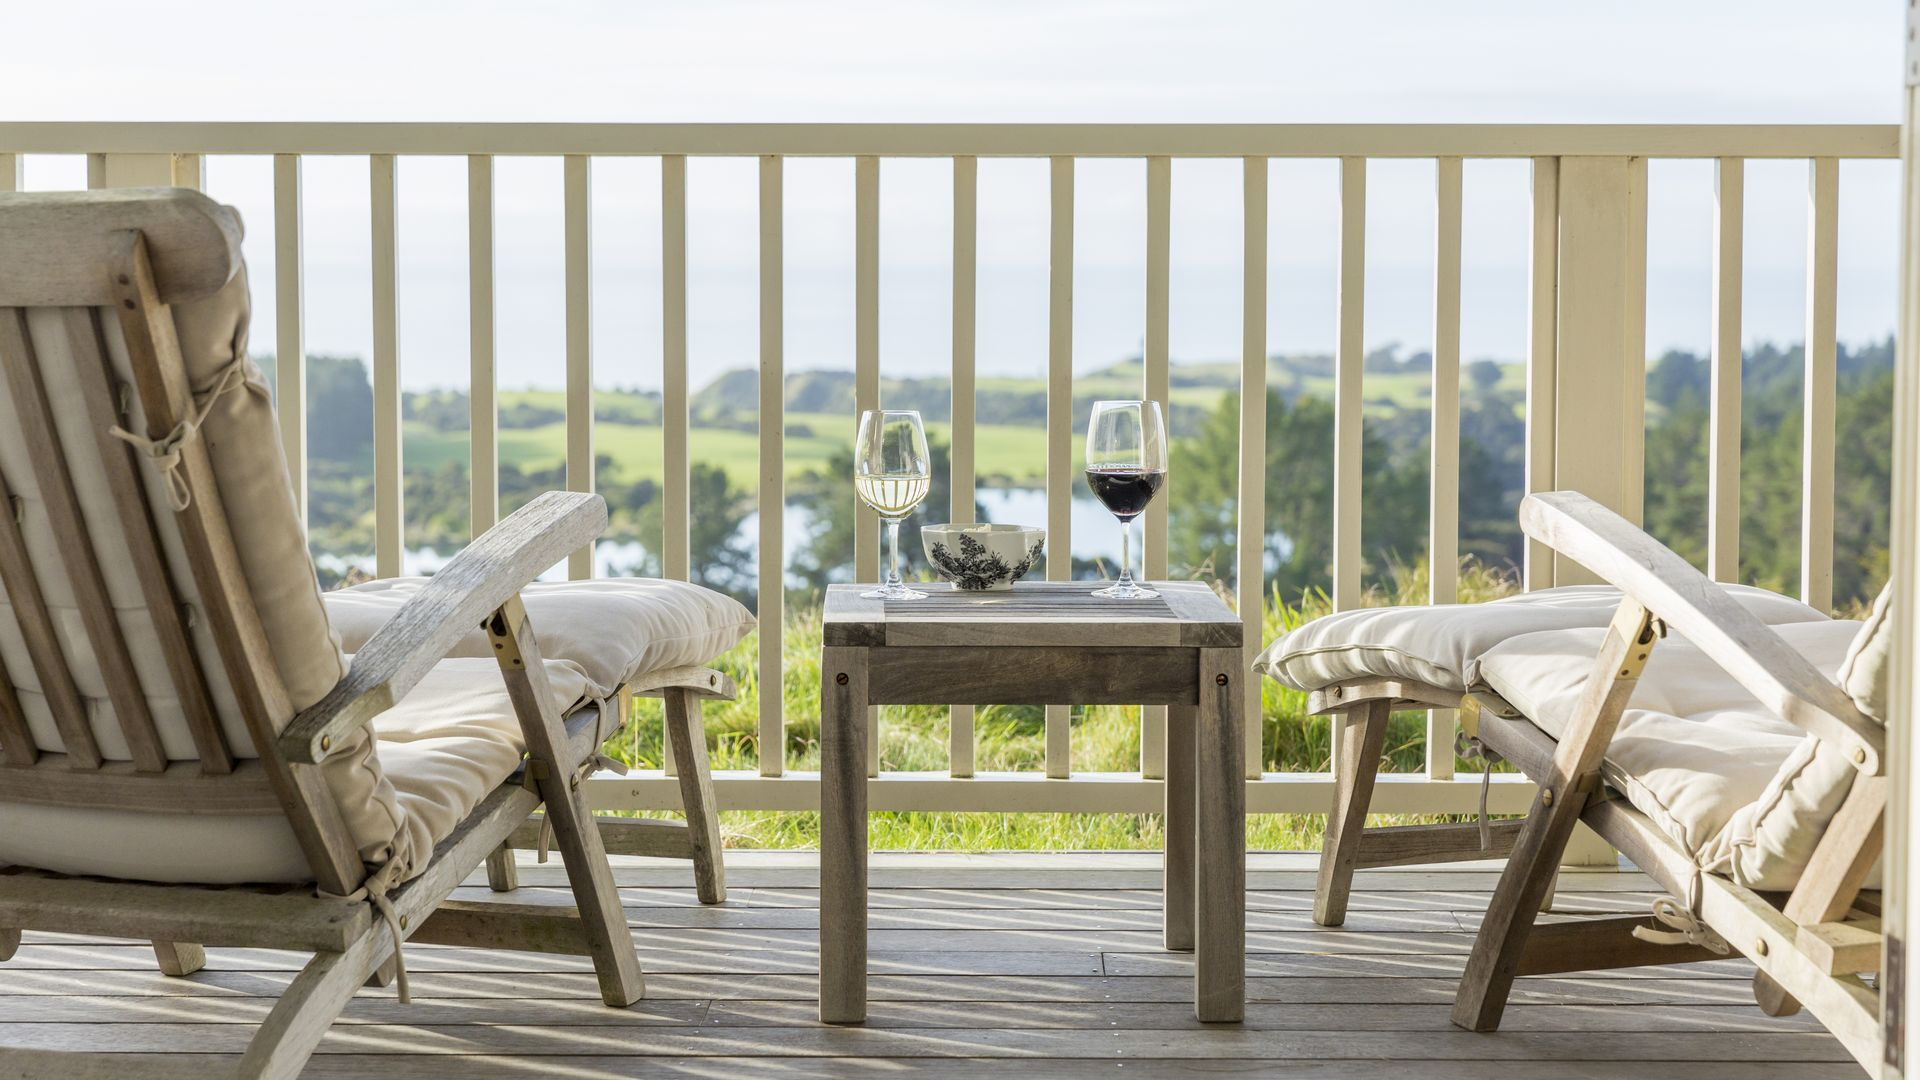 patio furniture overlooking a farm